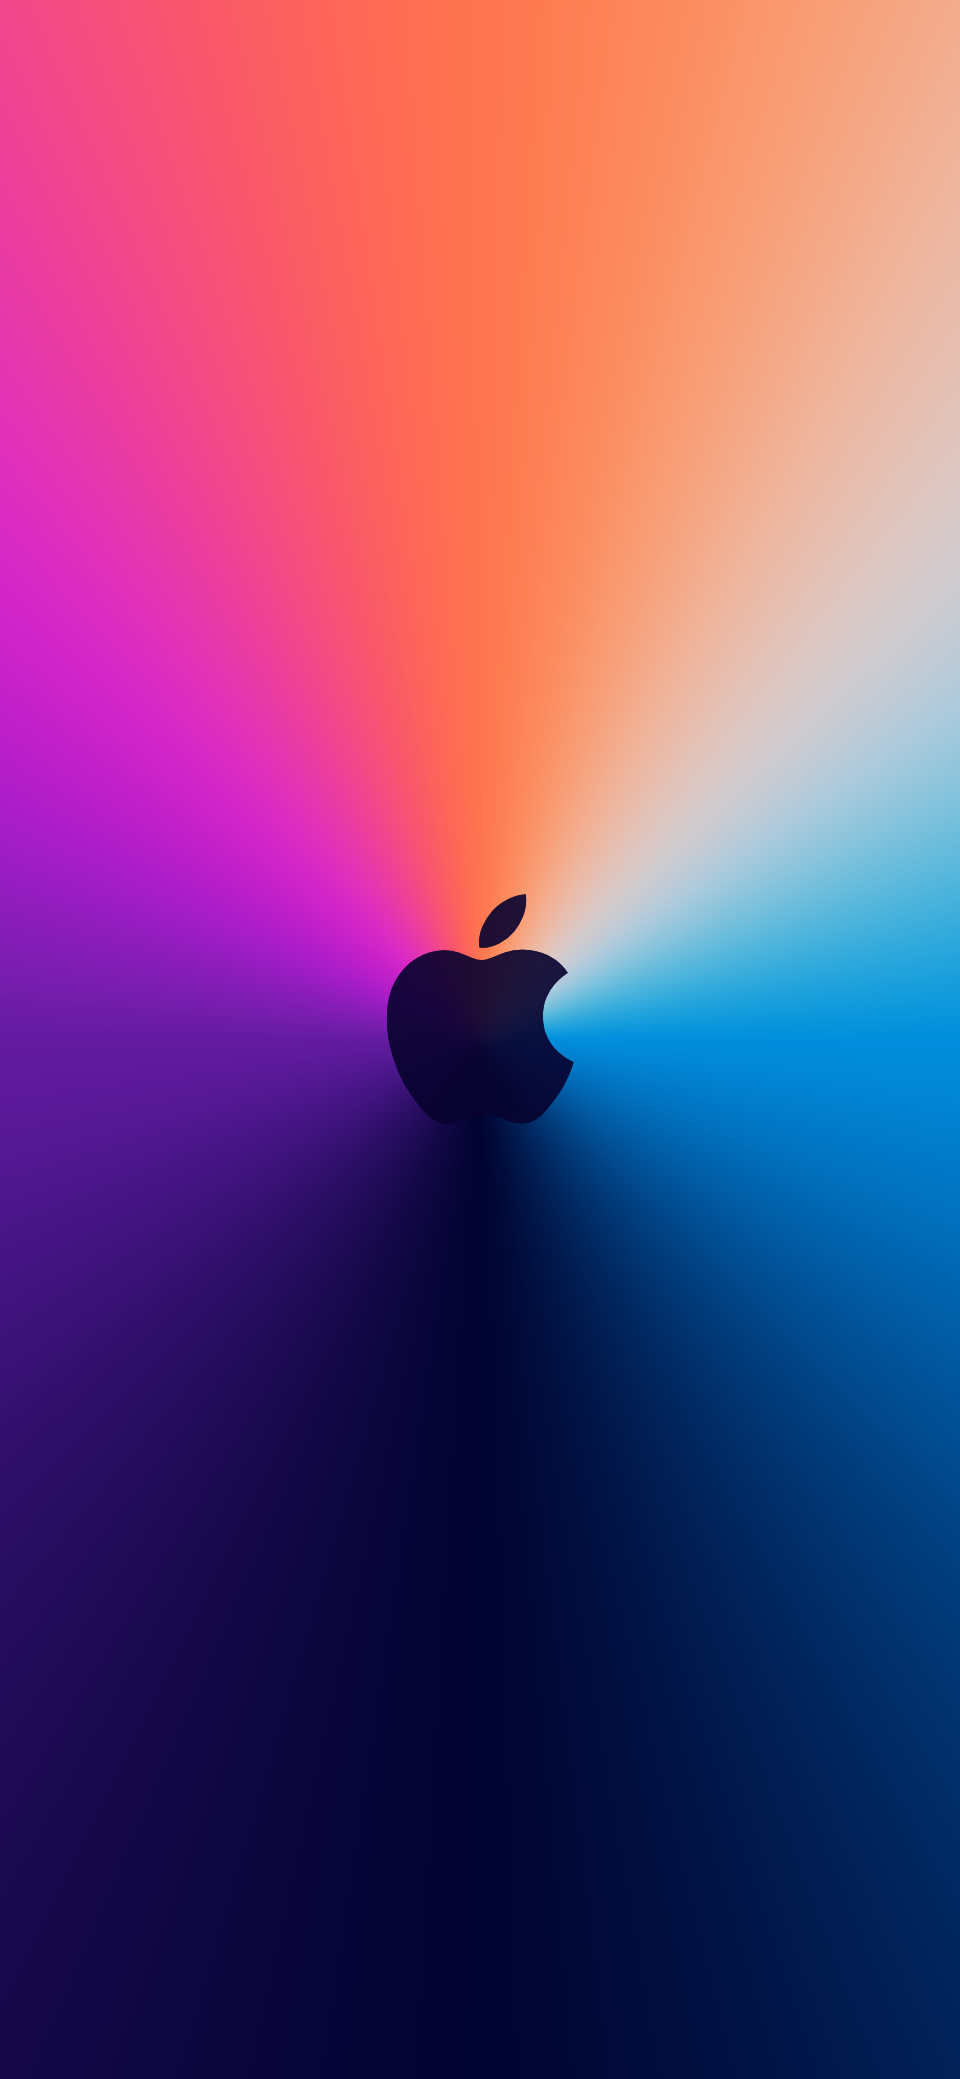 Iphone 12 Pro Max Wallpaper In 2021 Apple Logo Wallpaper Iphone Apple Wallpaper Iphone Iphone Wallpaper Logo